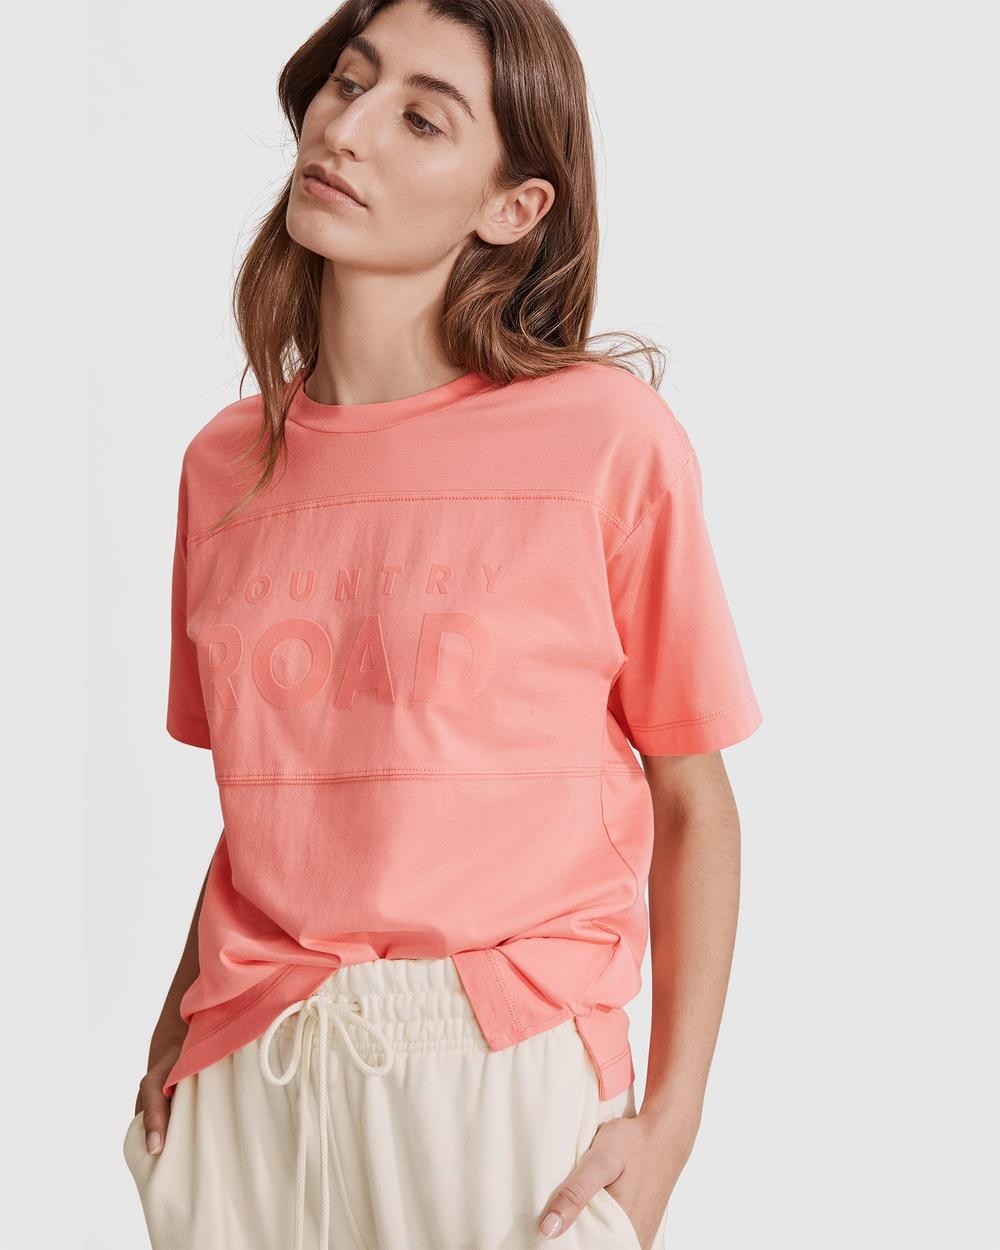 Country Road Verified Australian Cotton Modern Logo T shirt T-Shirts & Singlets pink T-shirt Australia